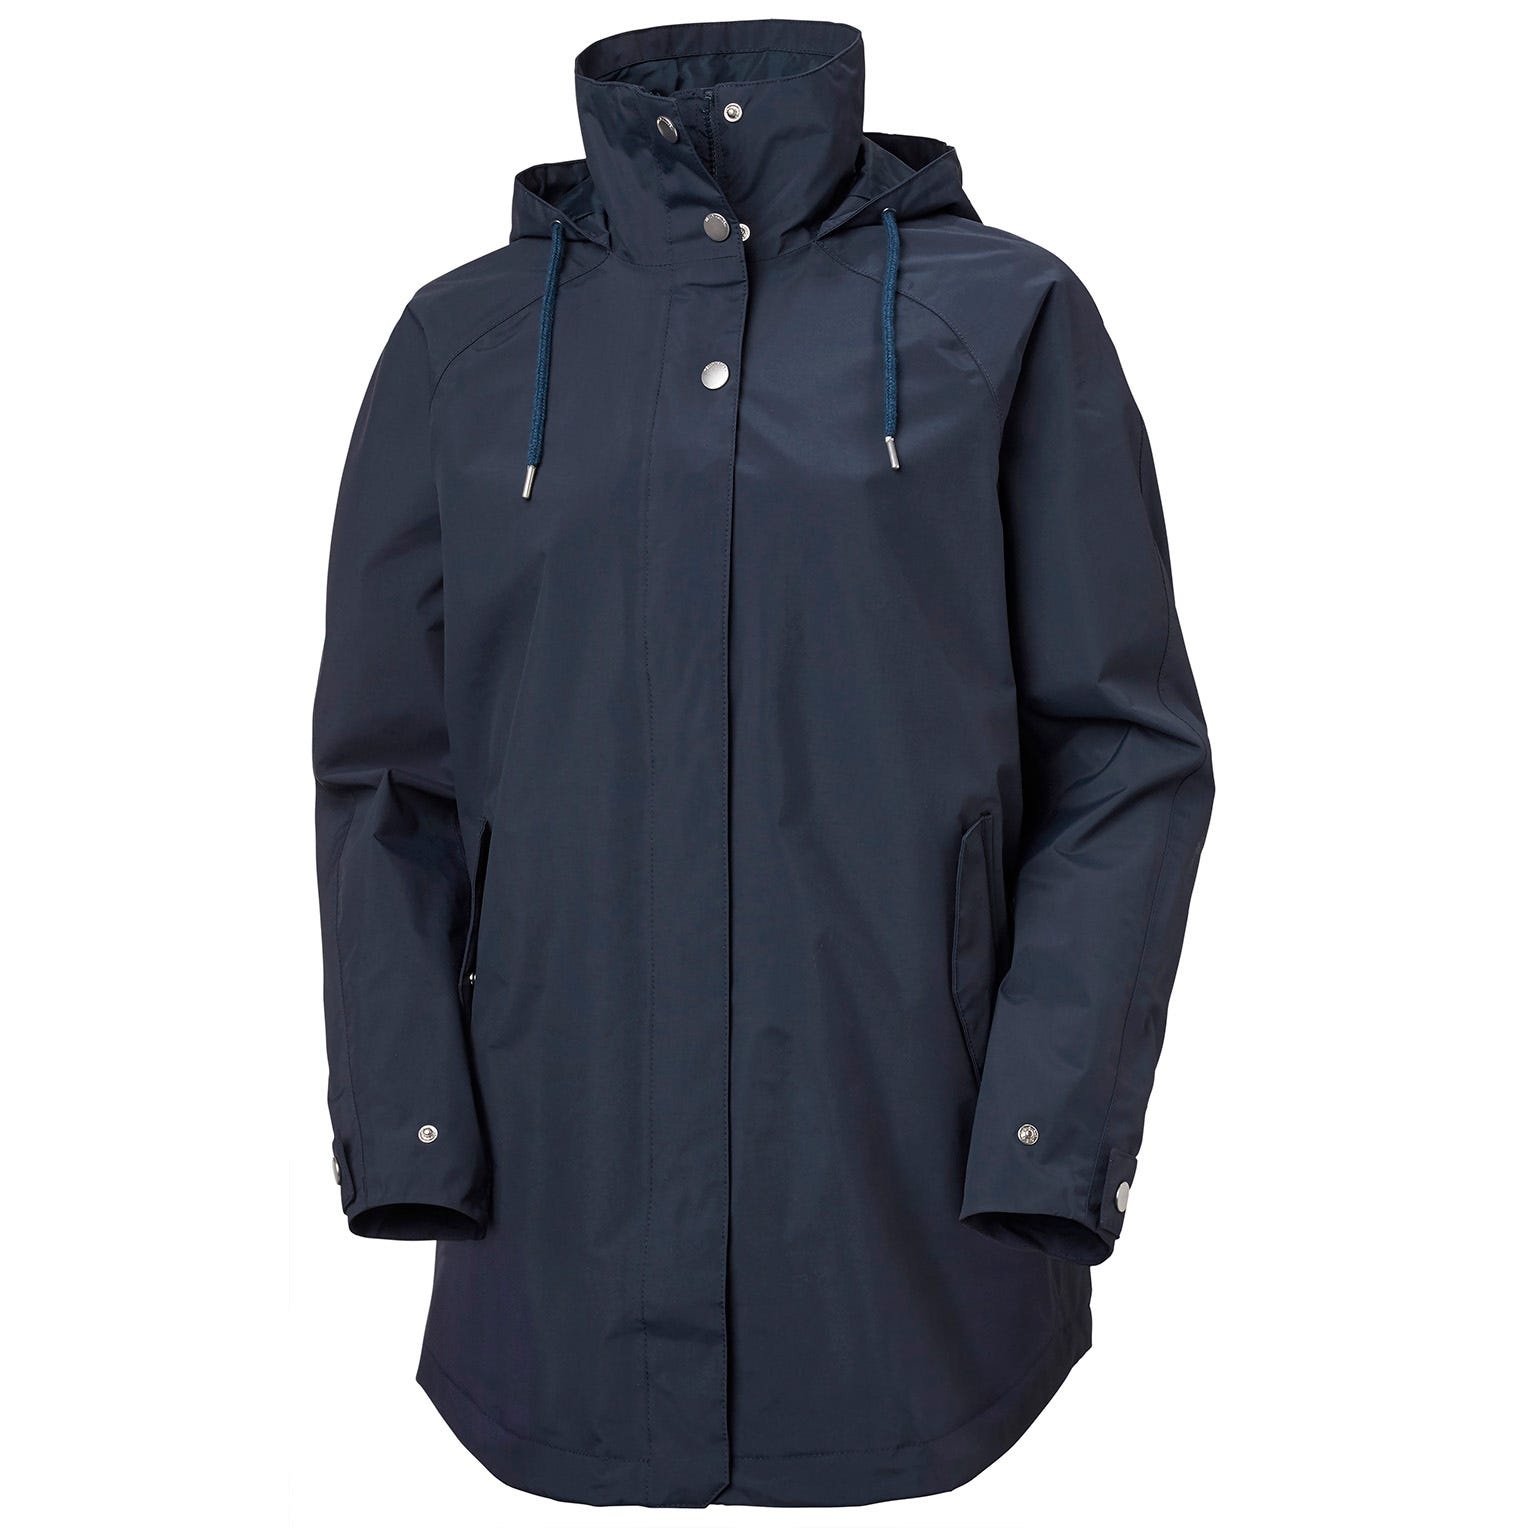 Womens Valentia Windproof Raincoat | Uk Helly Hansen Womens Rain Jacket Navy L